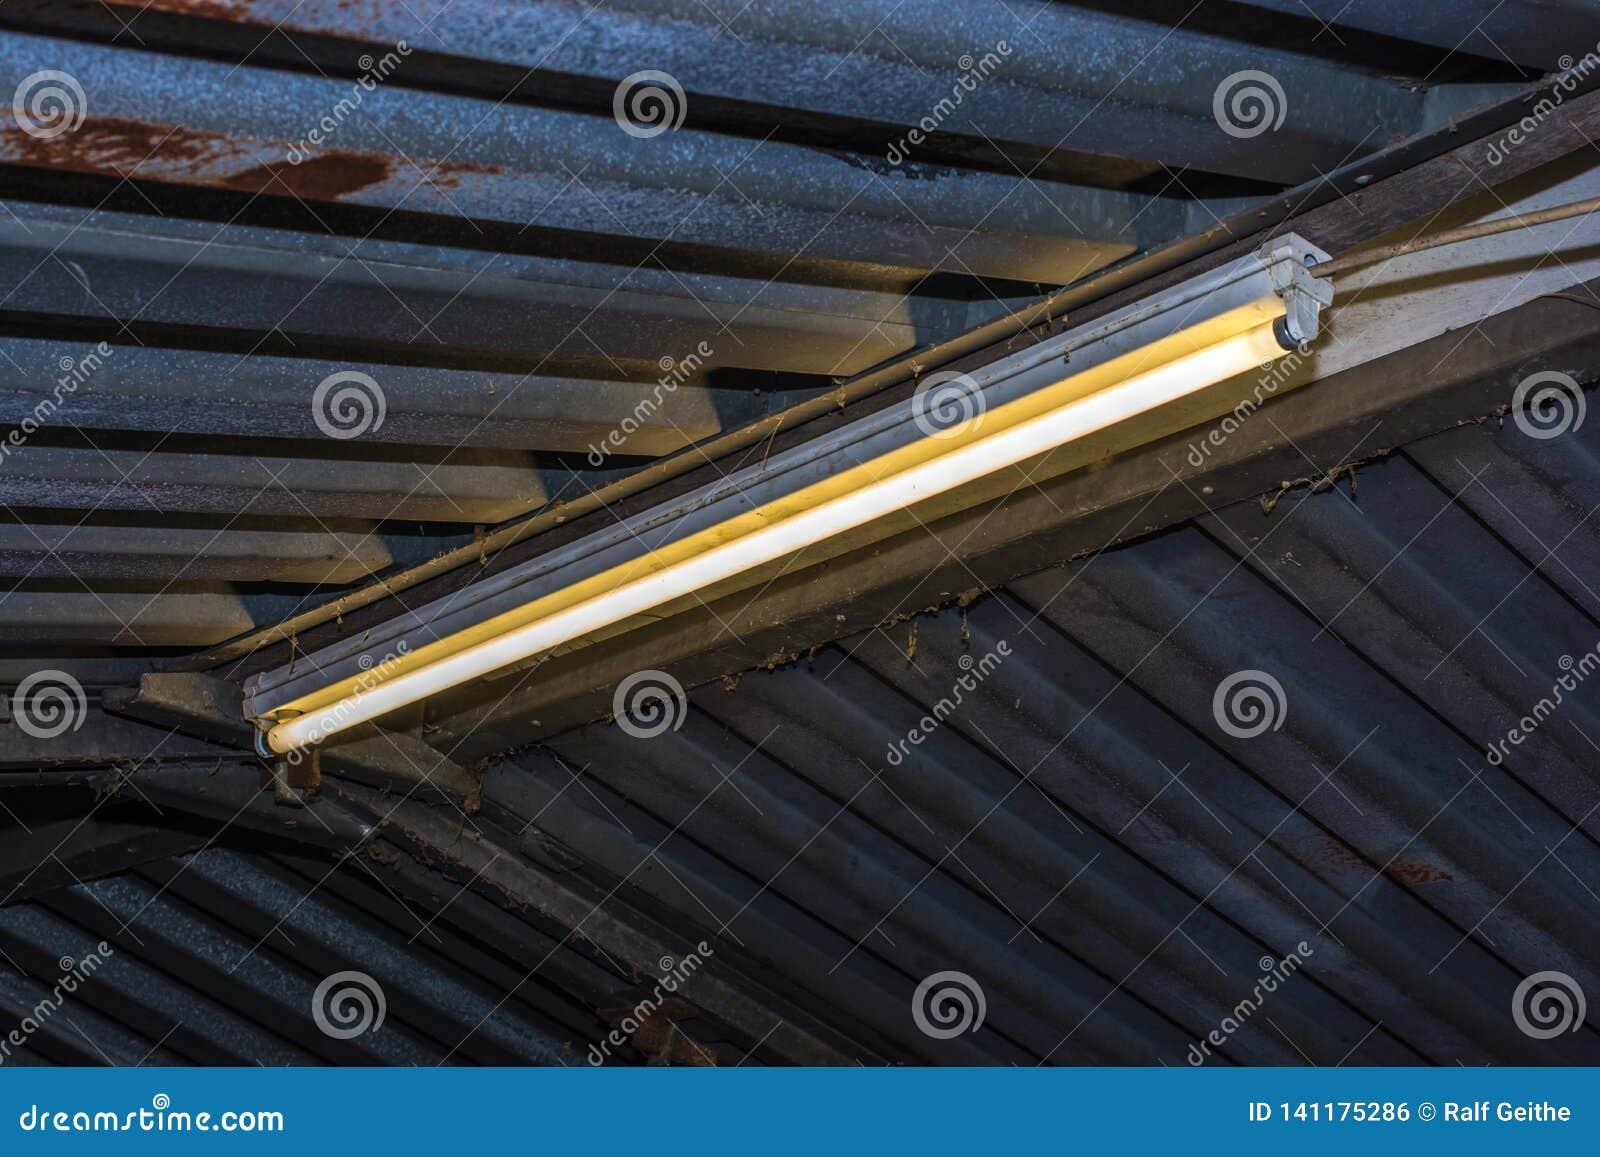 Fluorescent tube in a garage